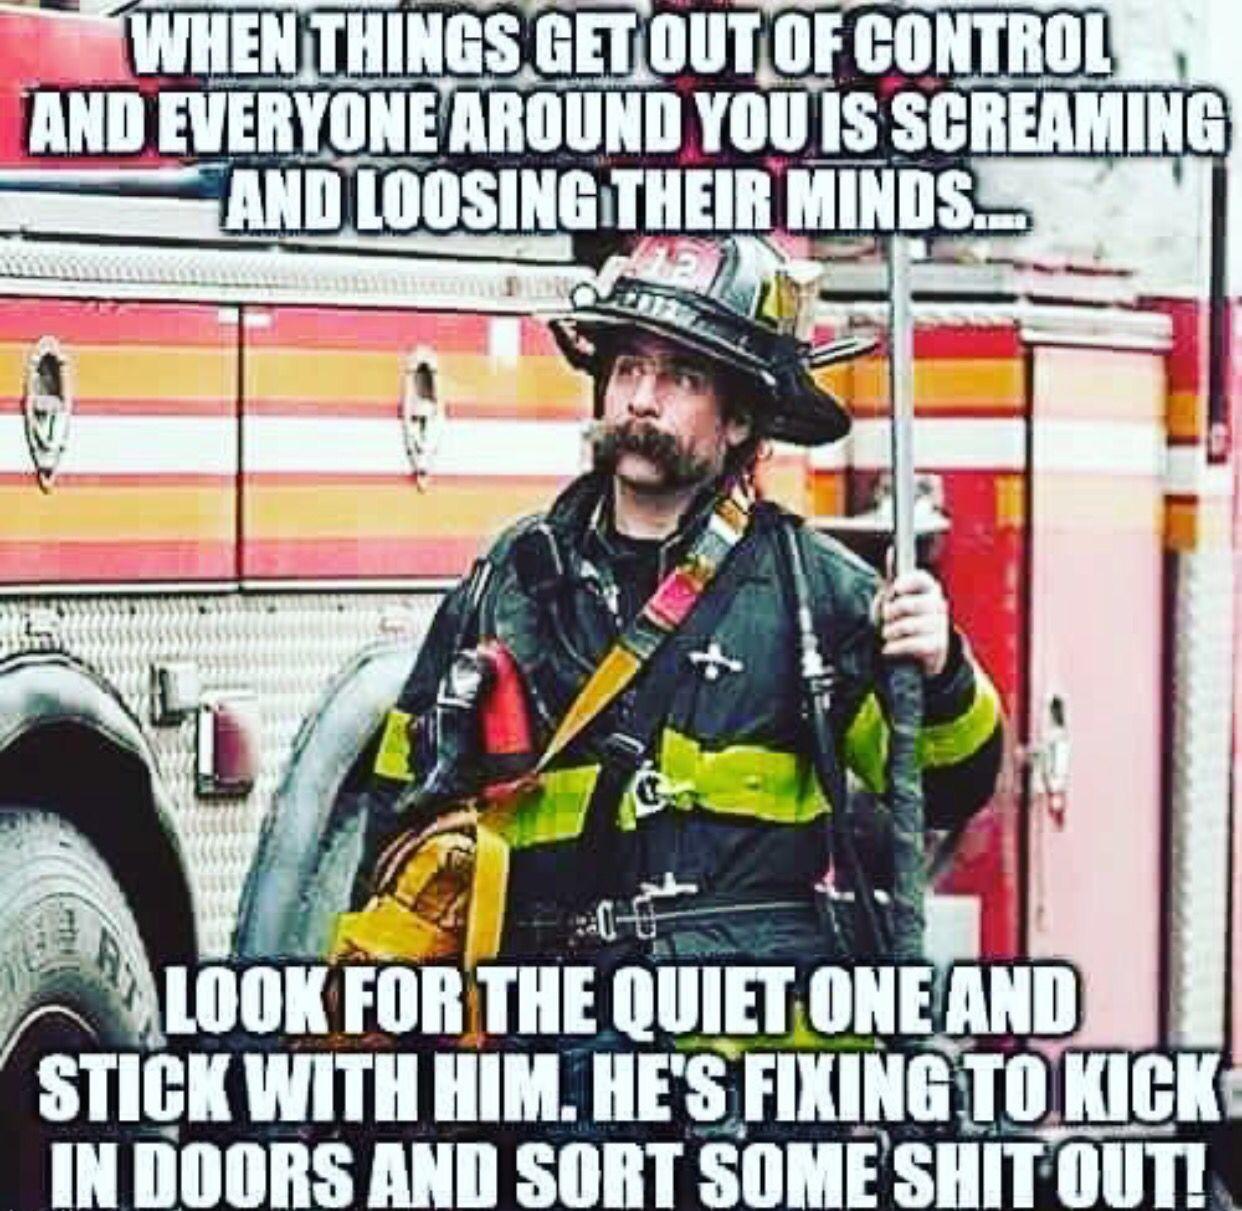 812e347e4a9b9a65427bfea3ae9dbbbc old school fire fighters emt paramedic & fire pinterest fire